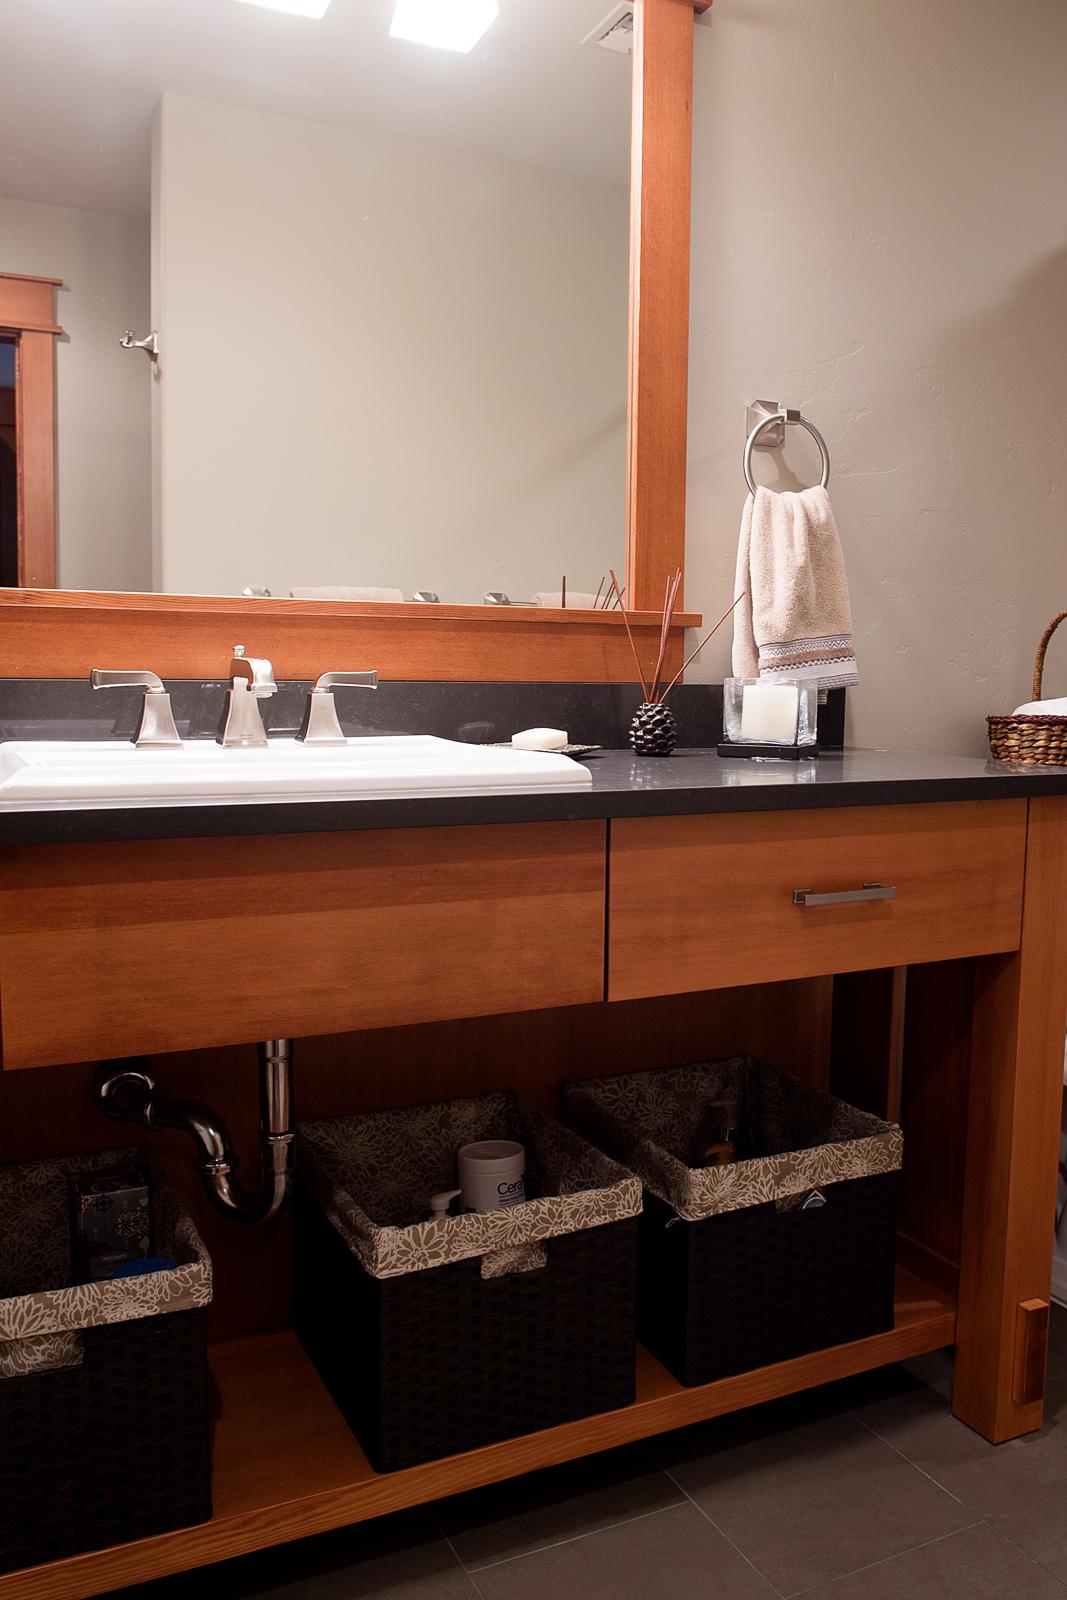 Woodworks-West-Bozeman-Montana-Builder-Cabinetry-Remodel-New-Construction-3652.jpg